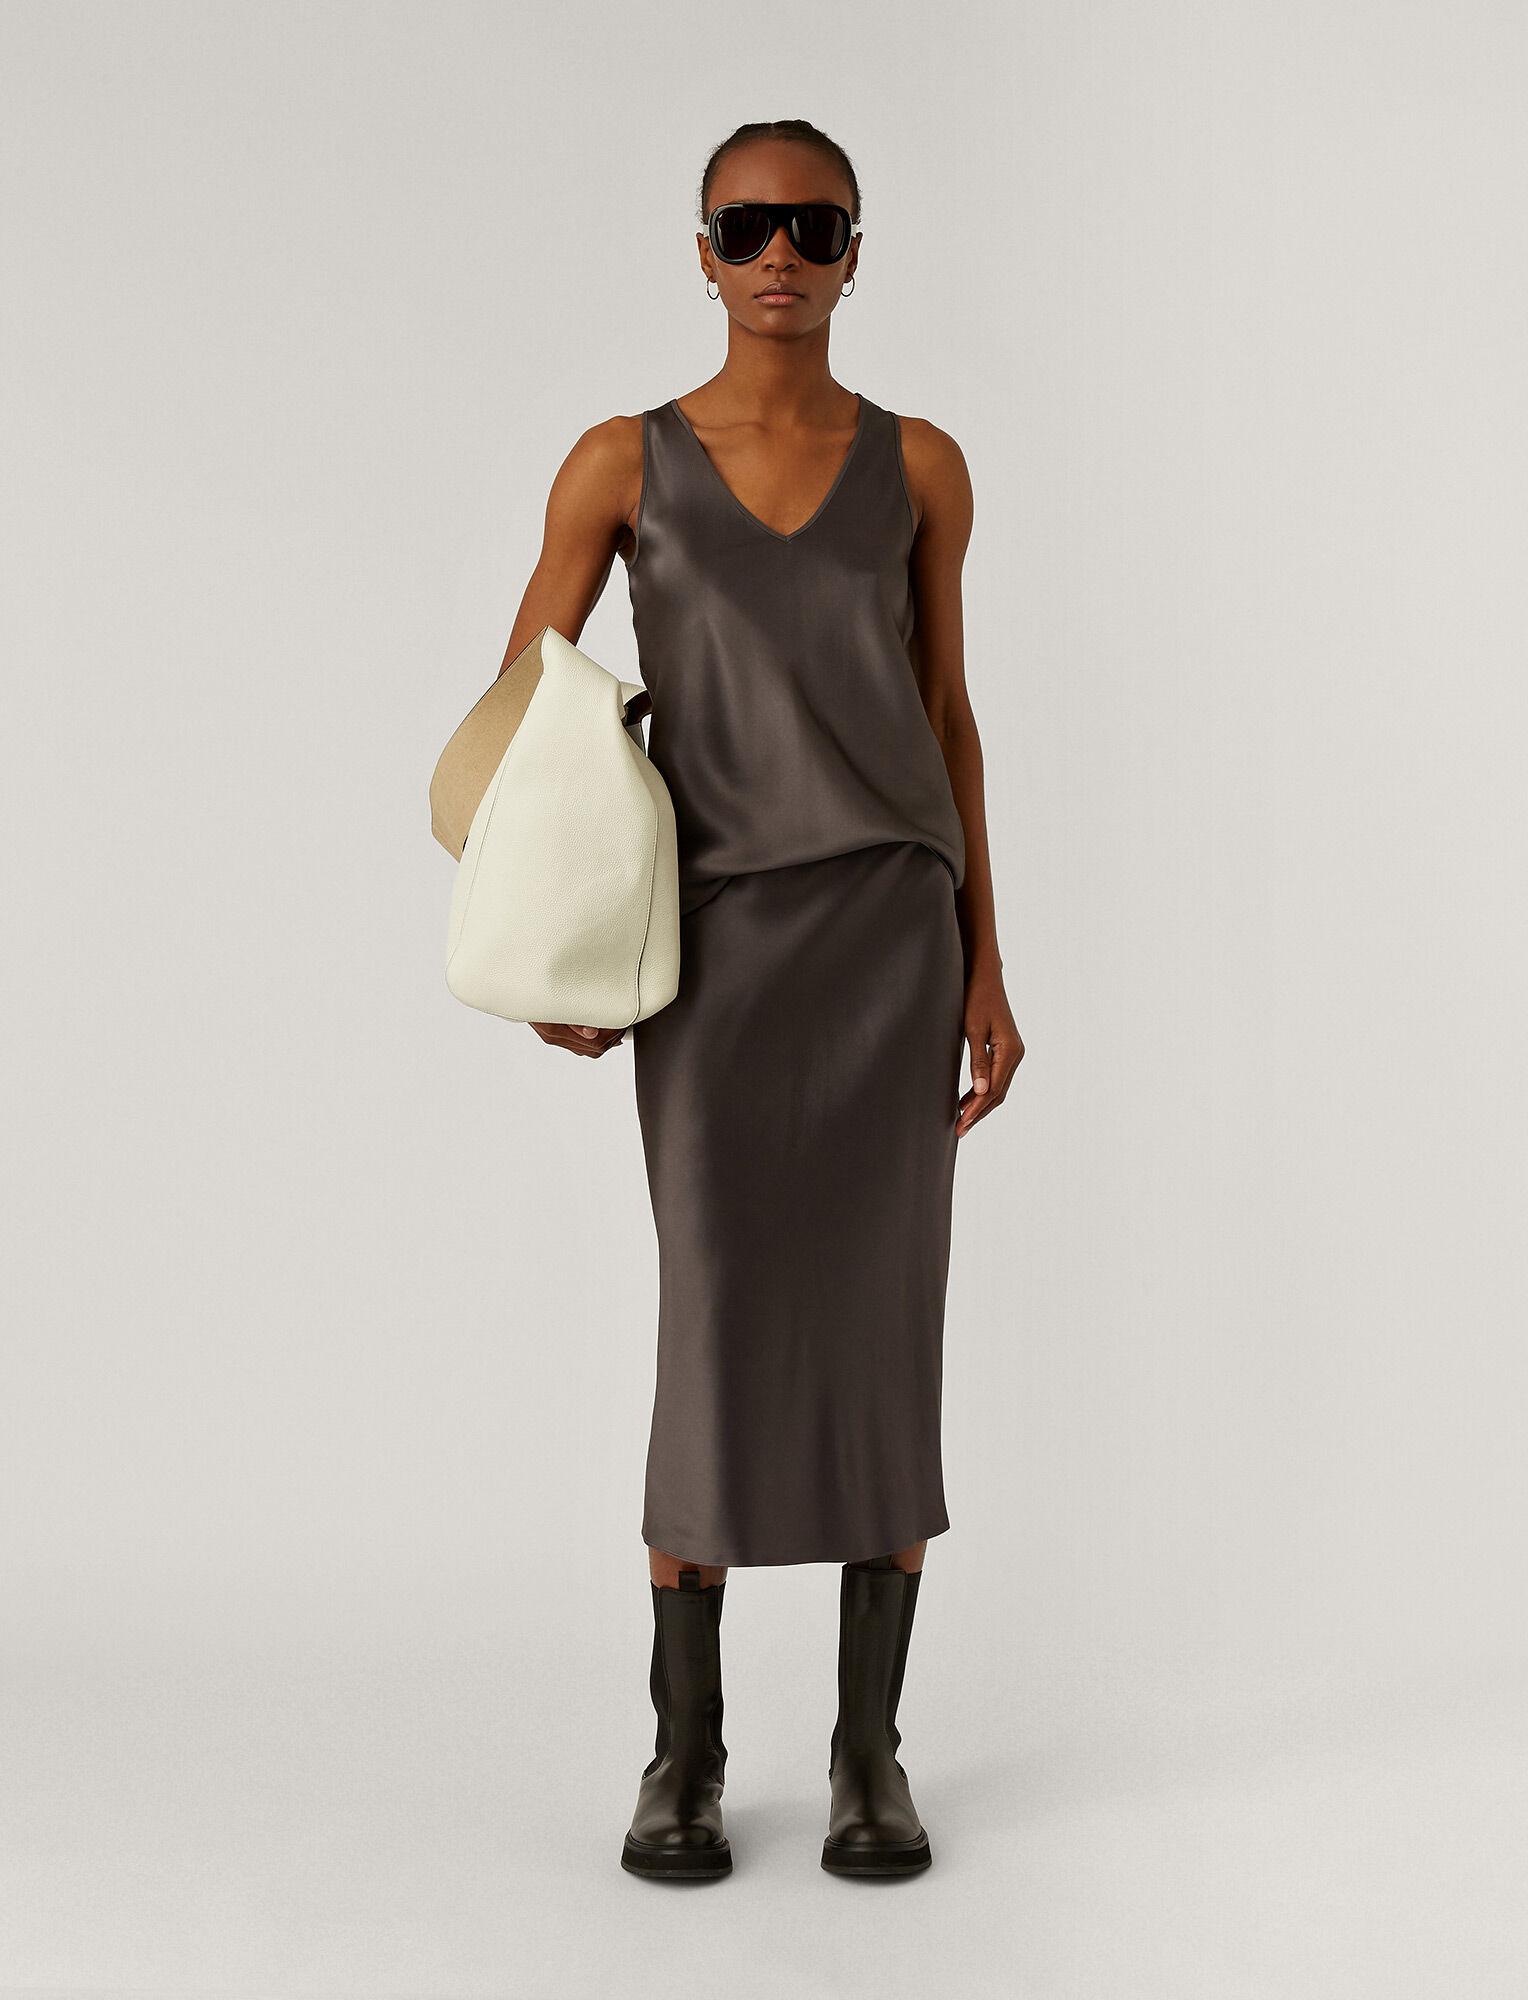 Joseph, Silk Satin Isaak Skirt, in ANTHRACITE